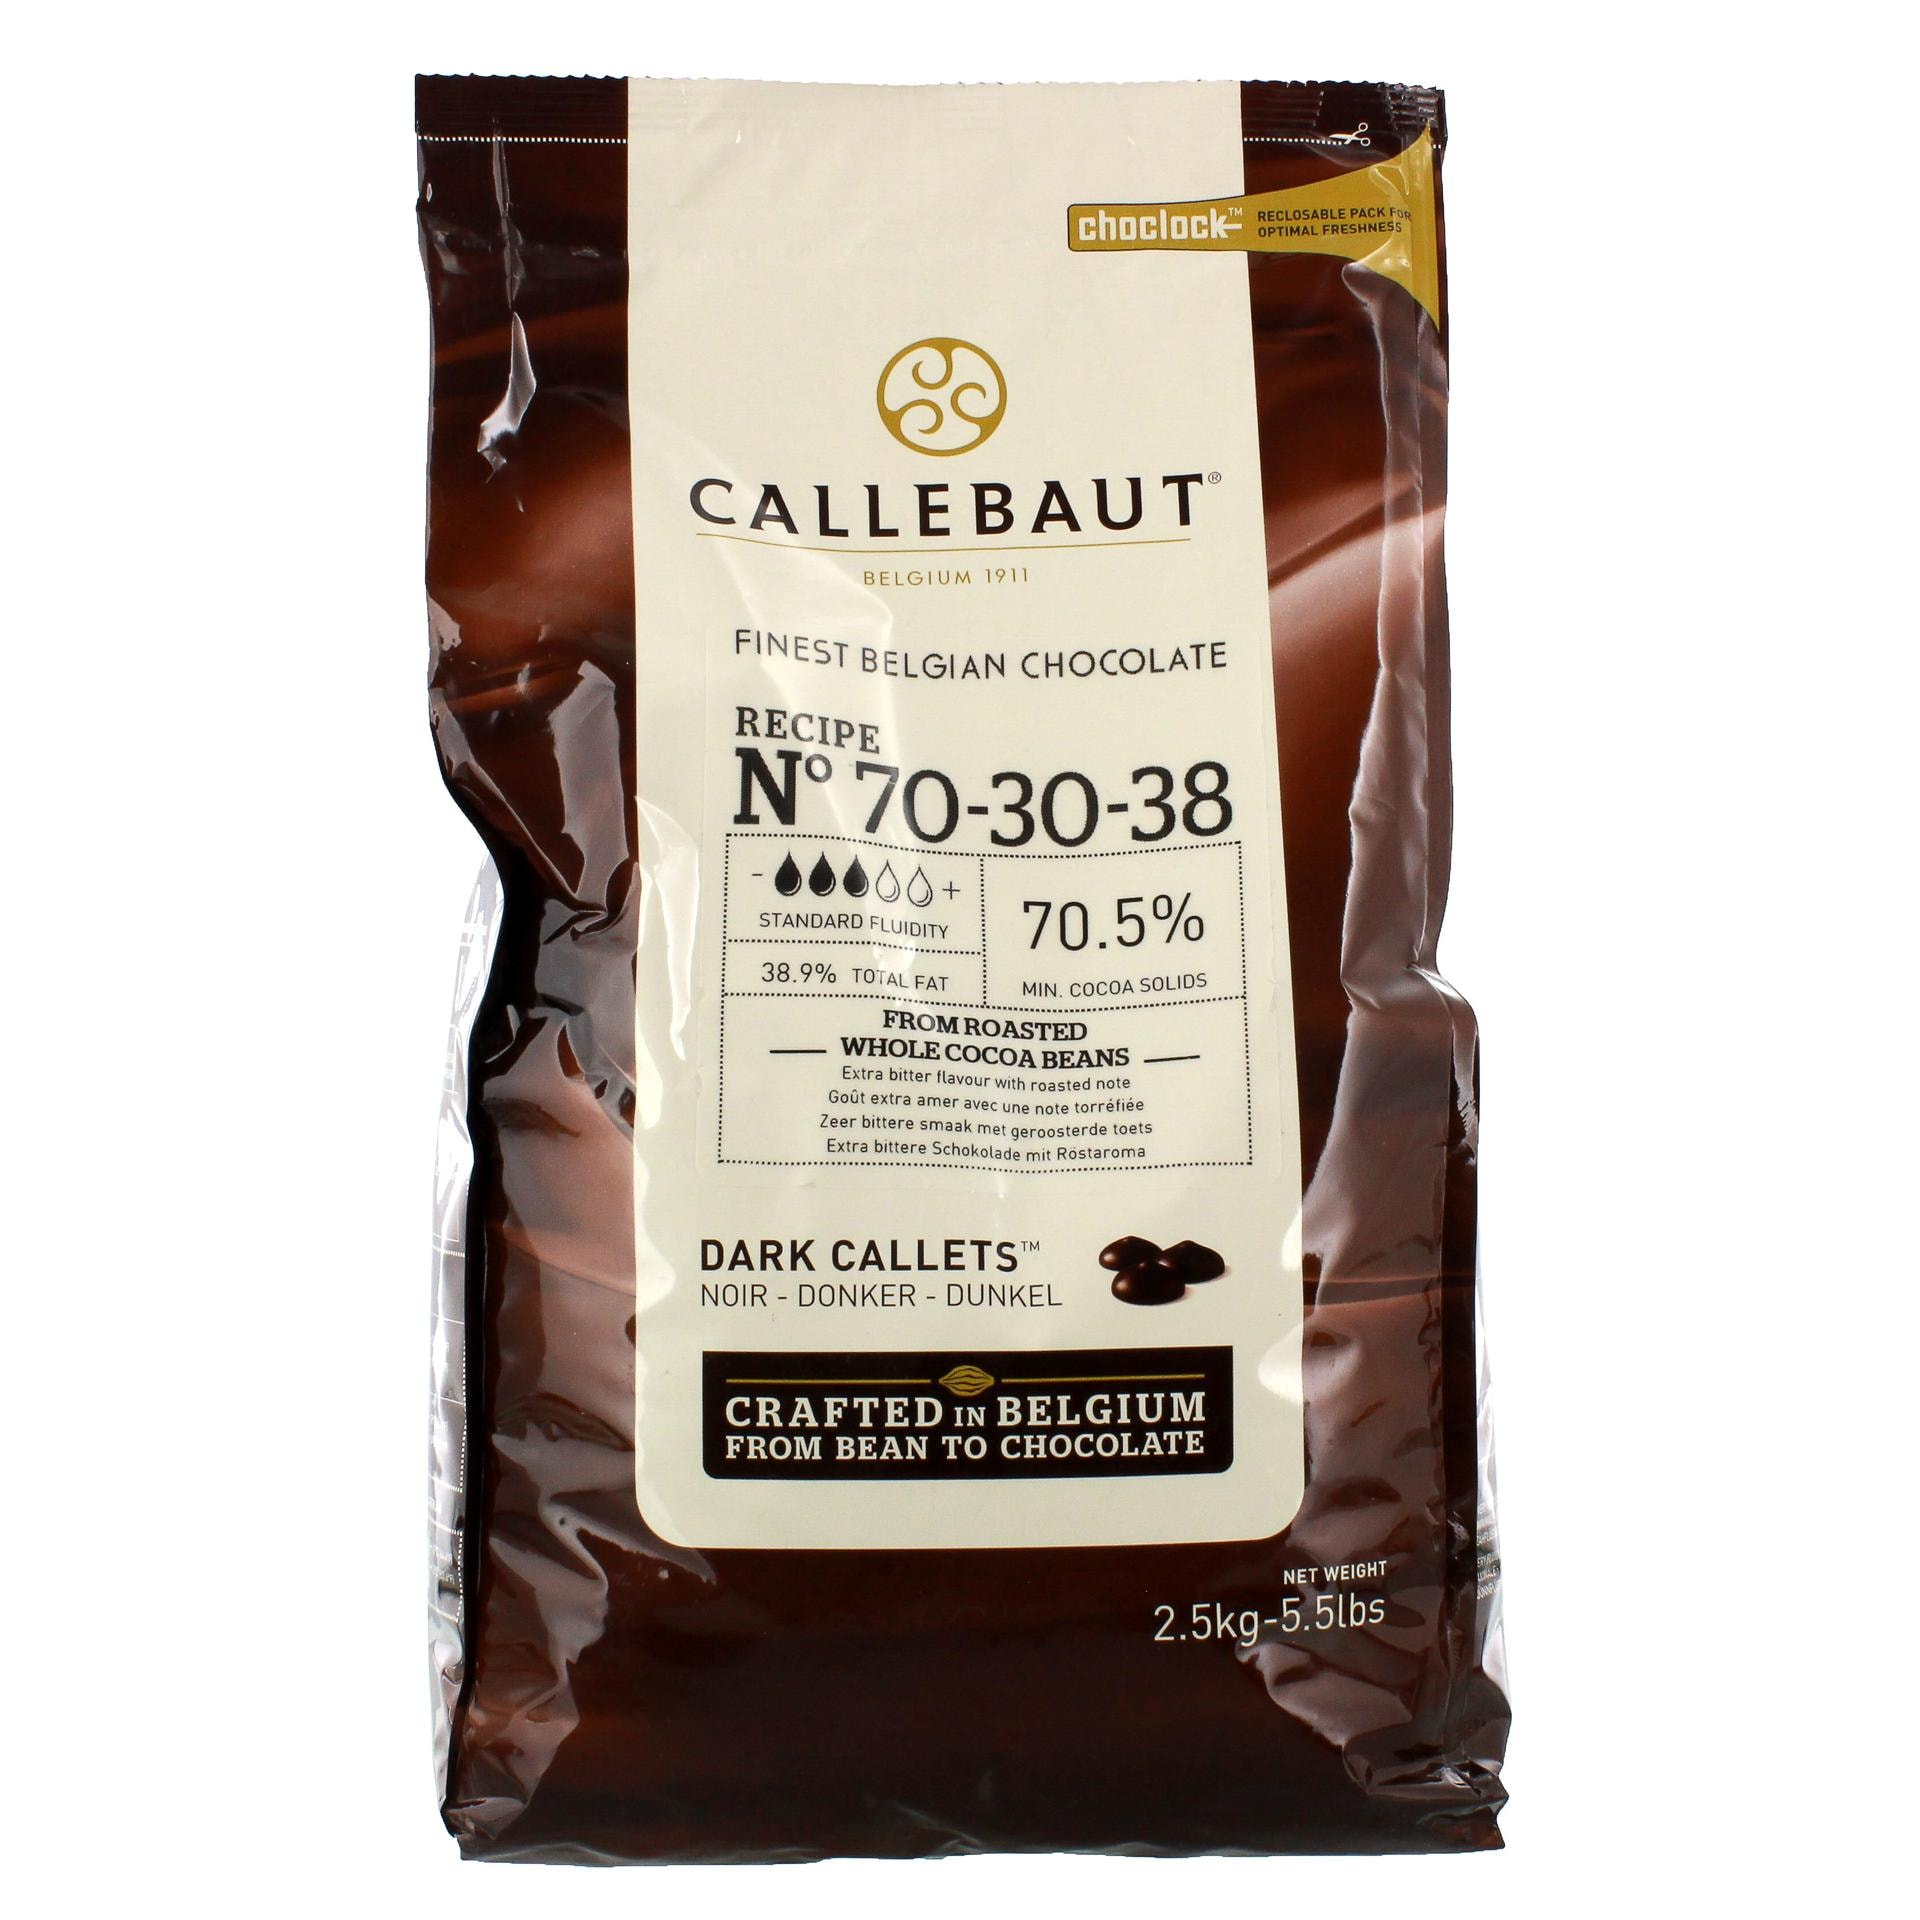 Callebaut - Dunkle Kuvertüre Callets Schokodrops - 2,5kg